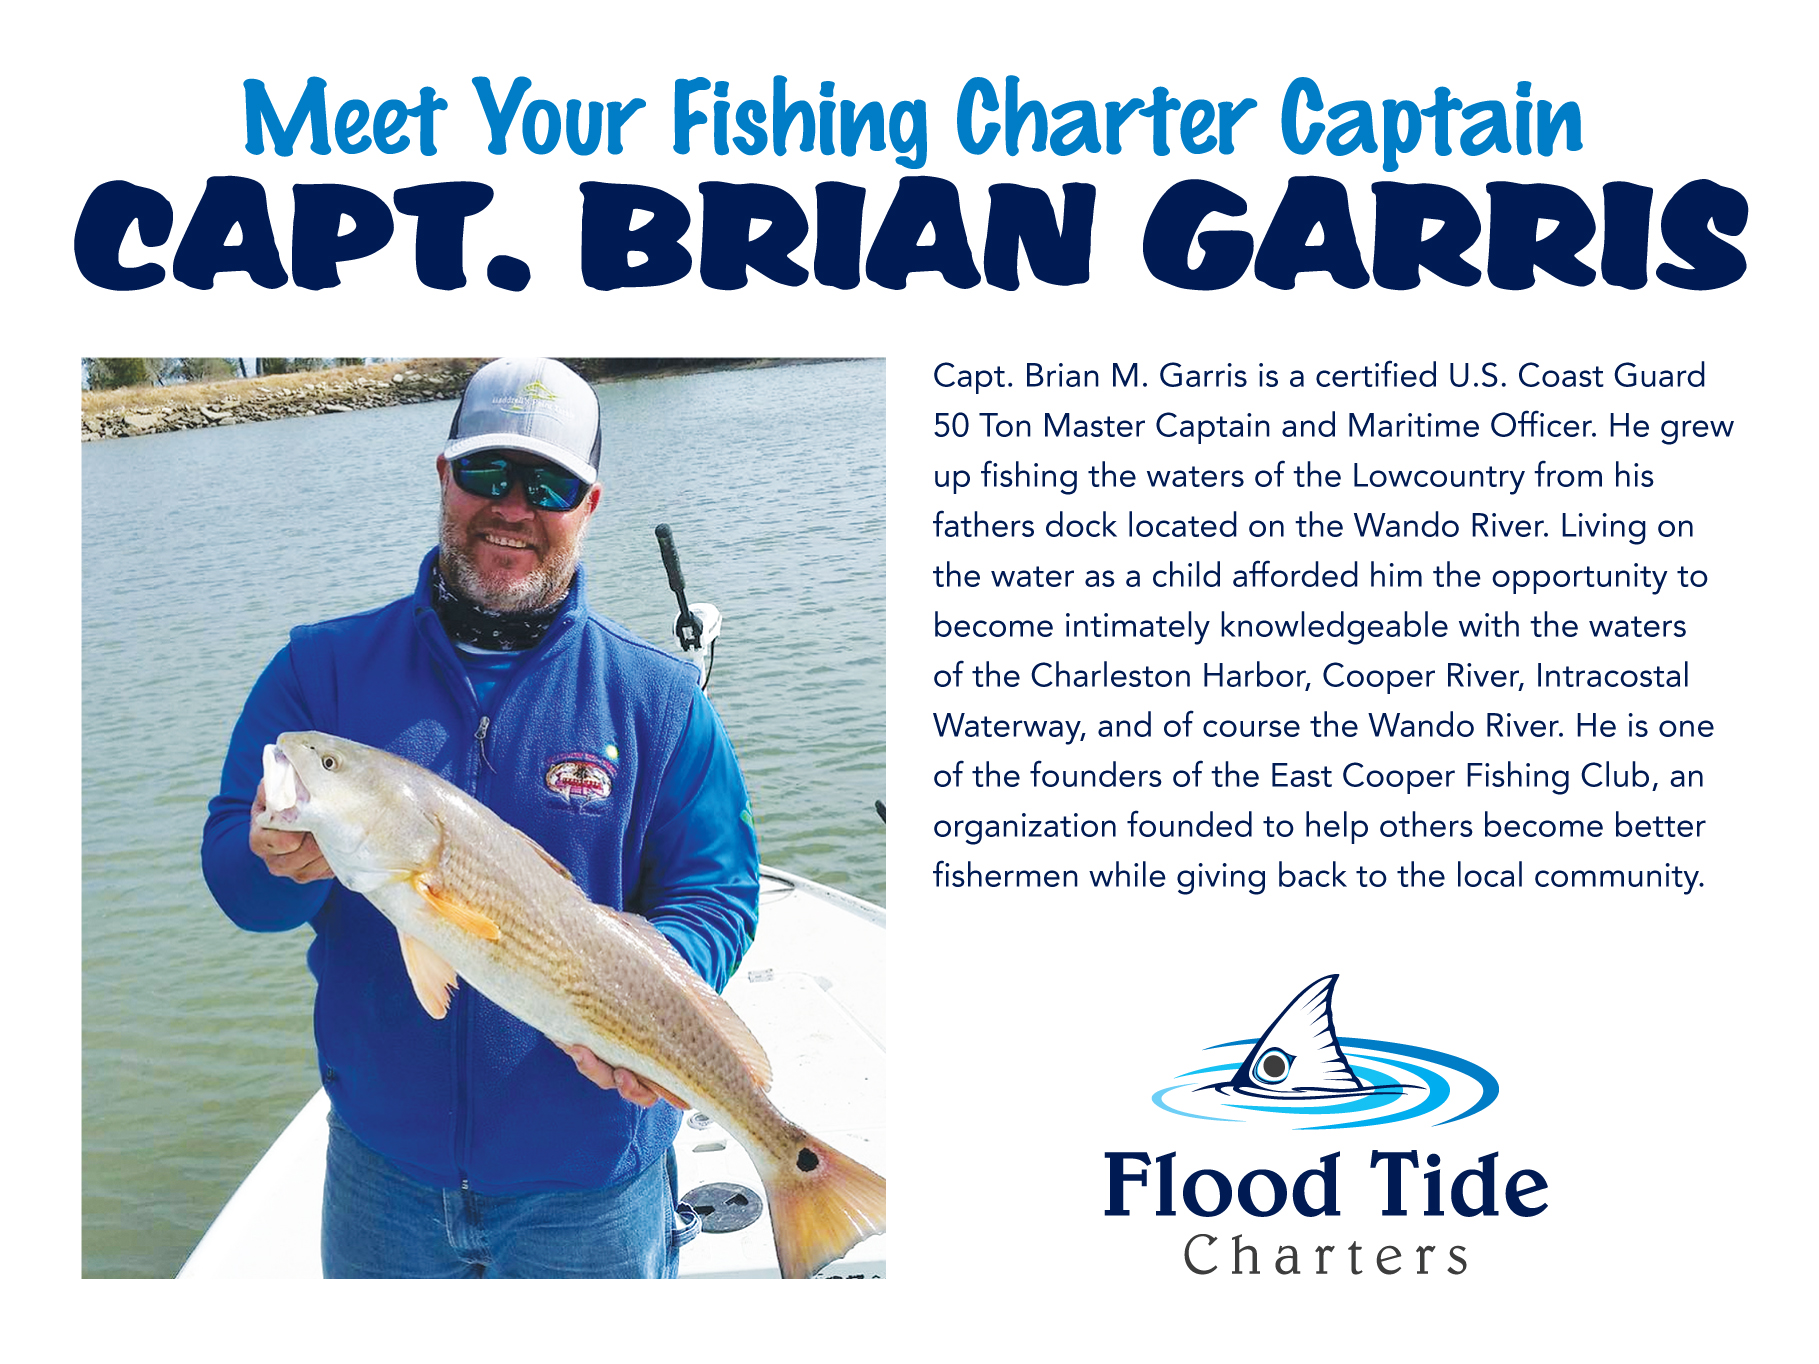 Flood Tide Charters About Capt Brian Garris